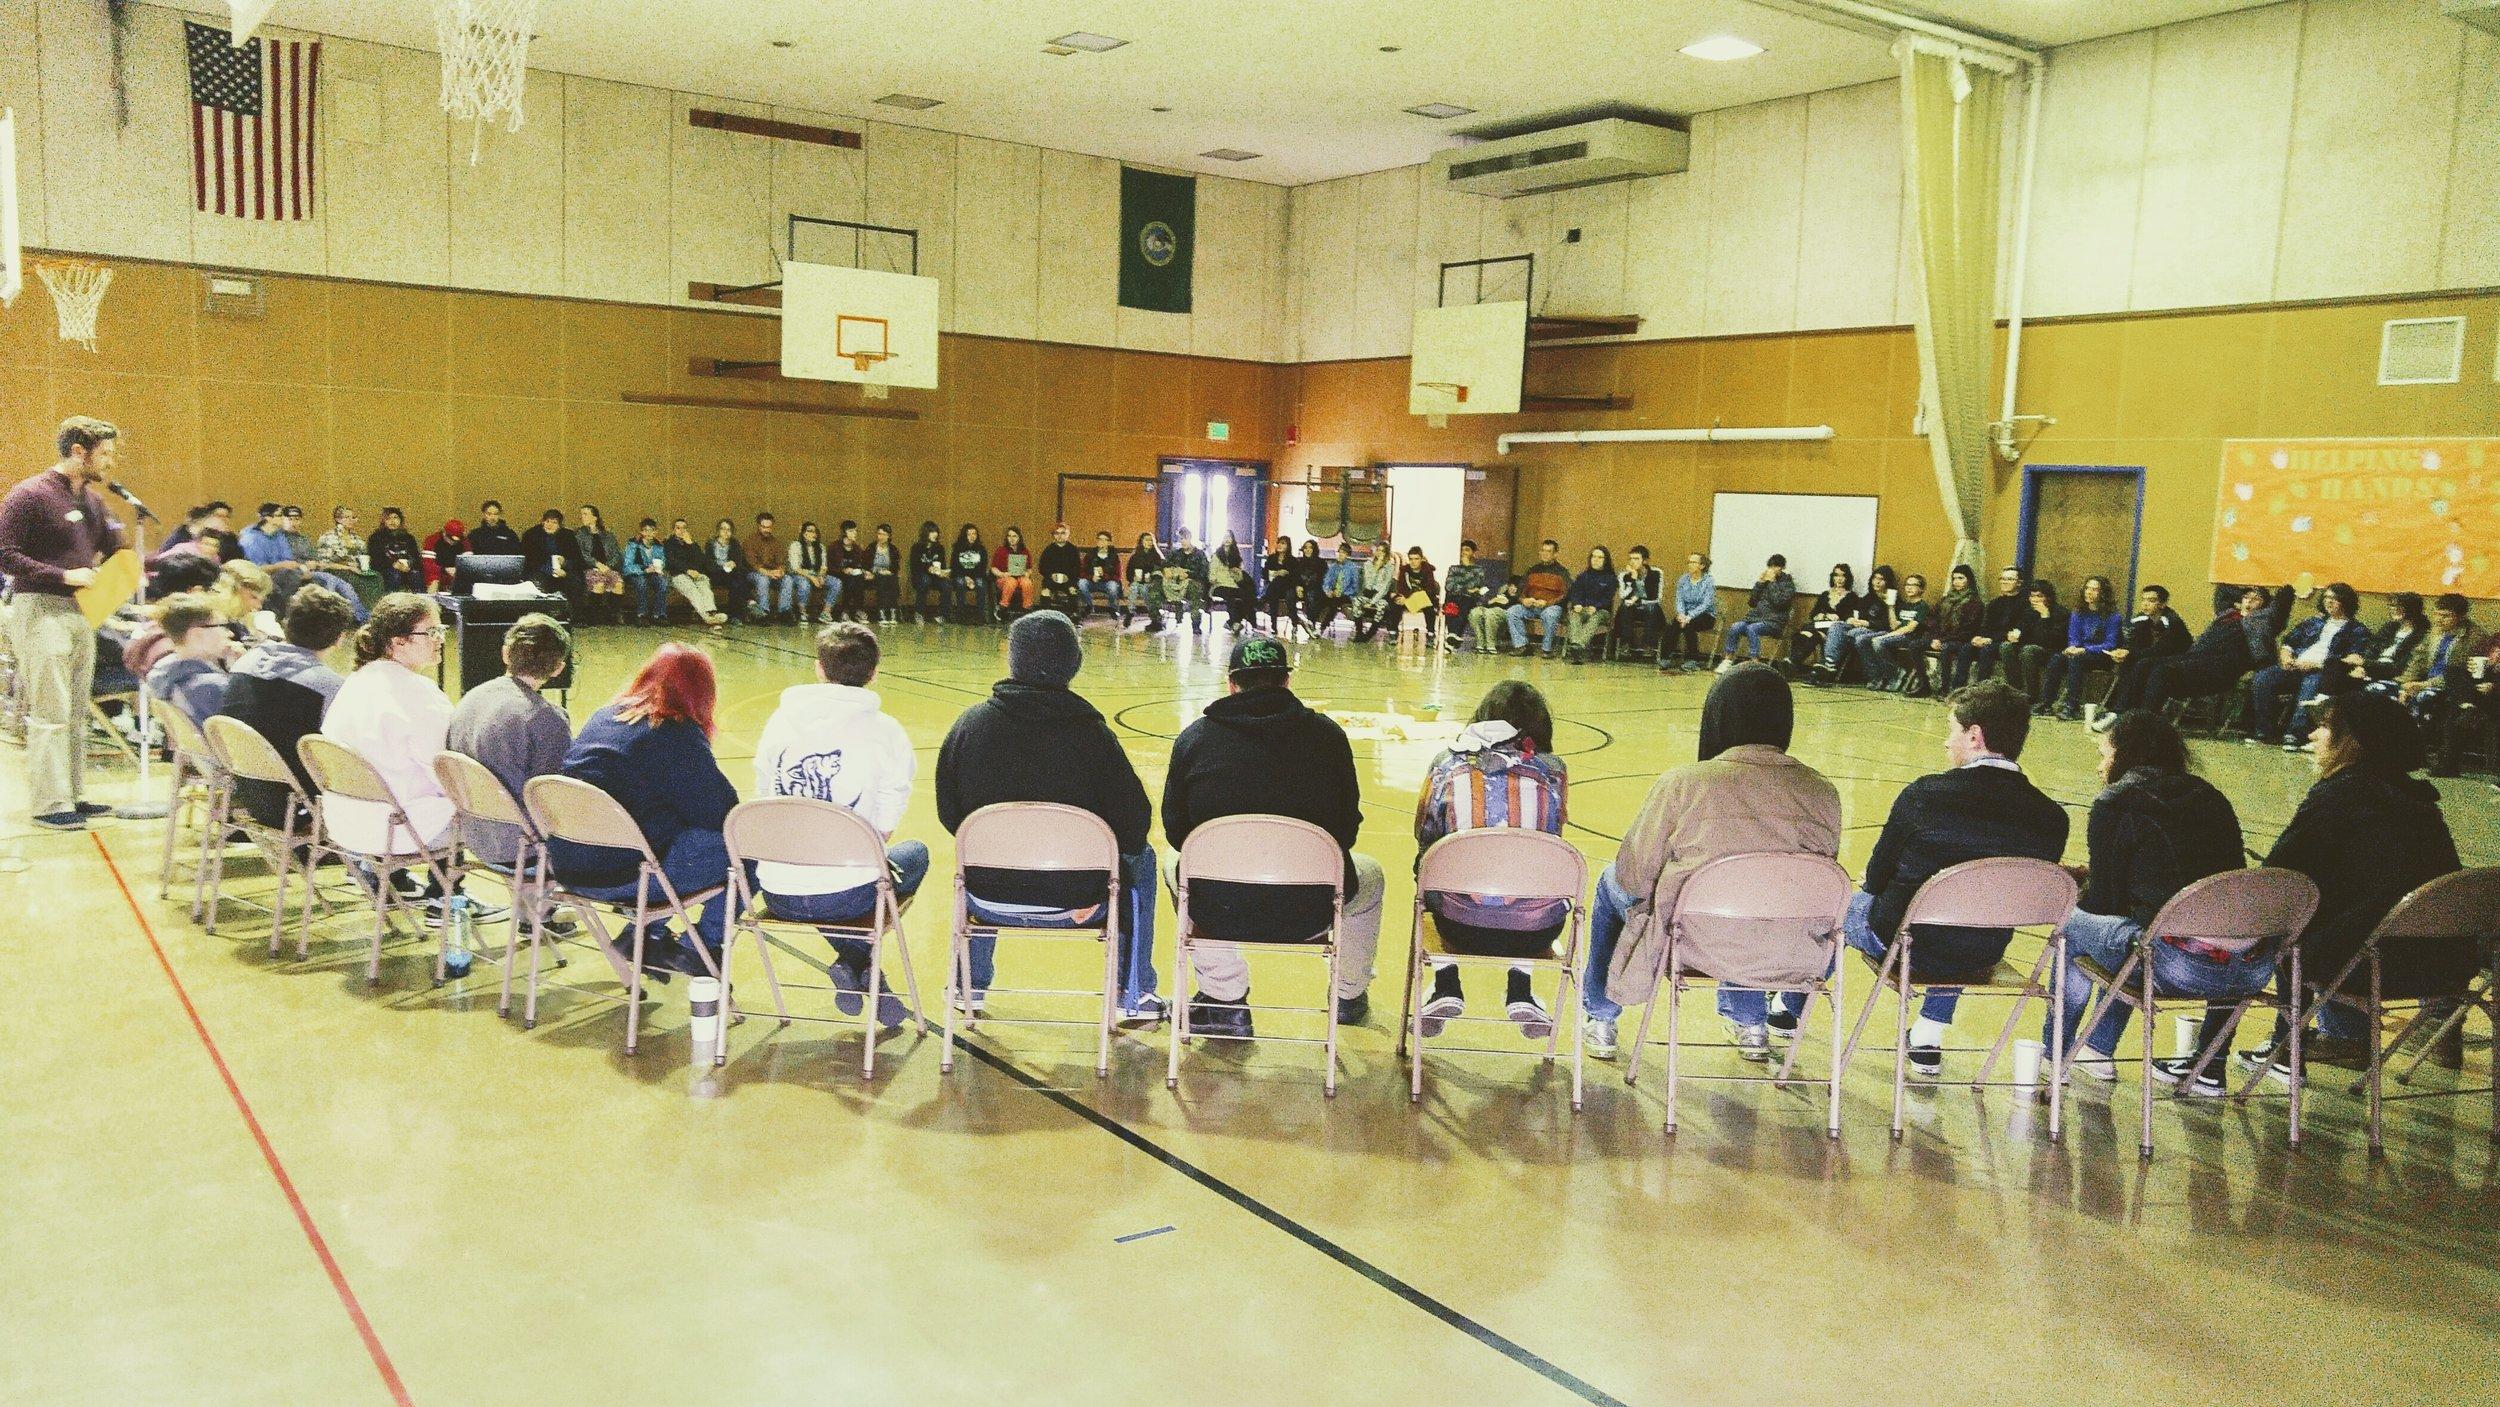 A school-wide restorative circle at Windward High School. Photo courtesy of daniel soloff.